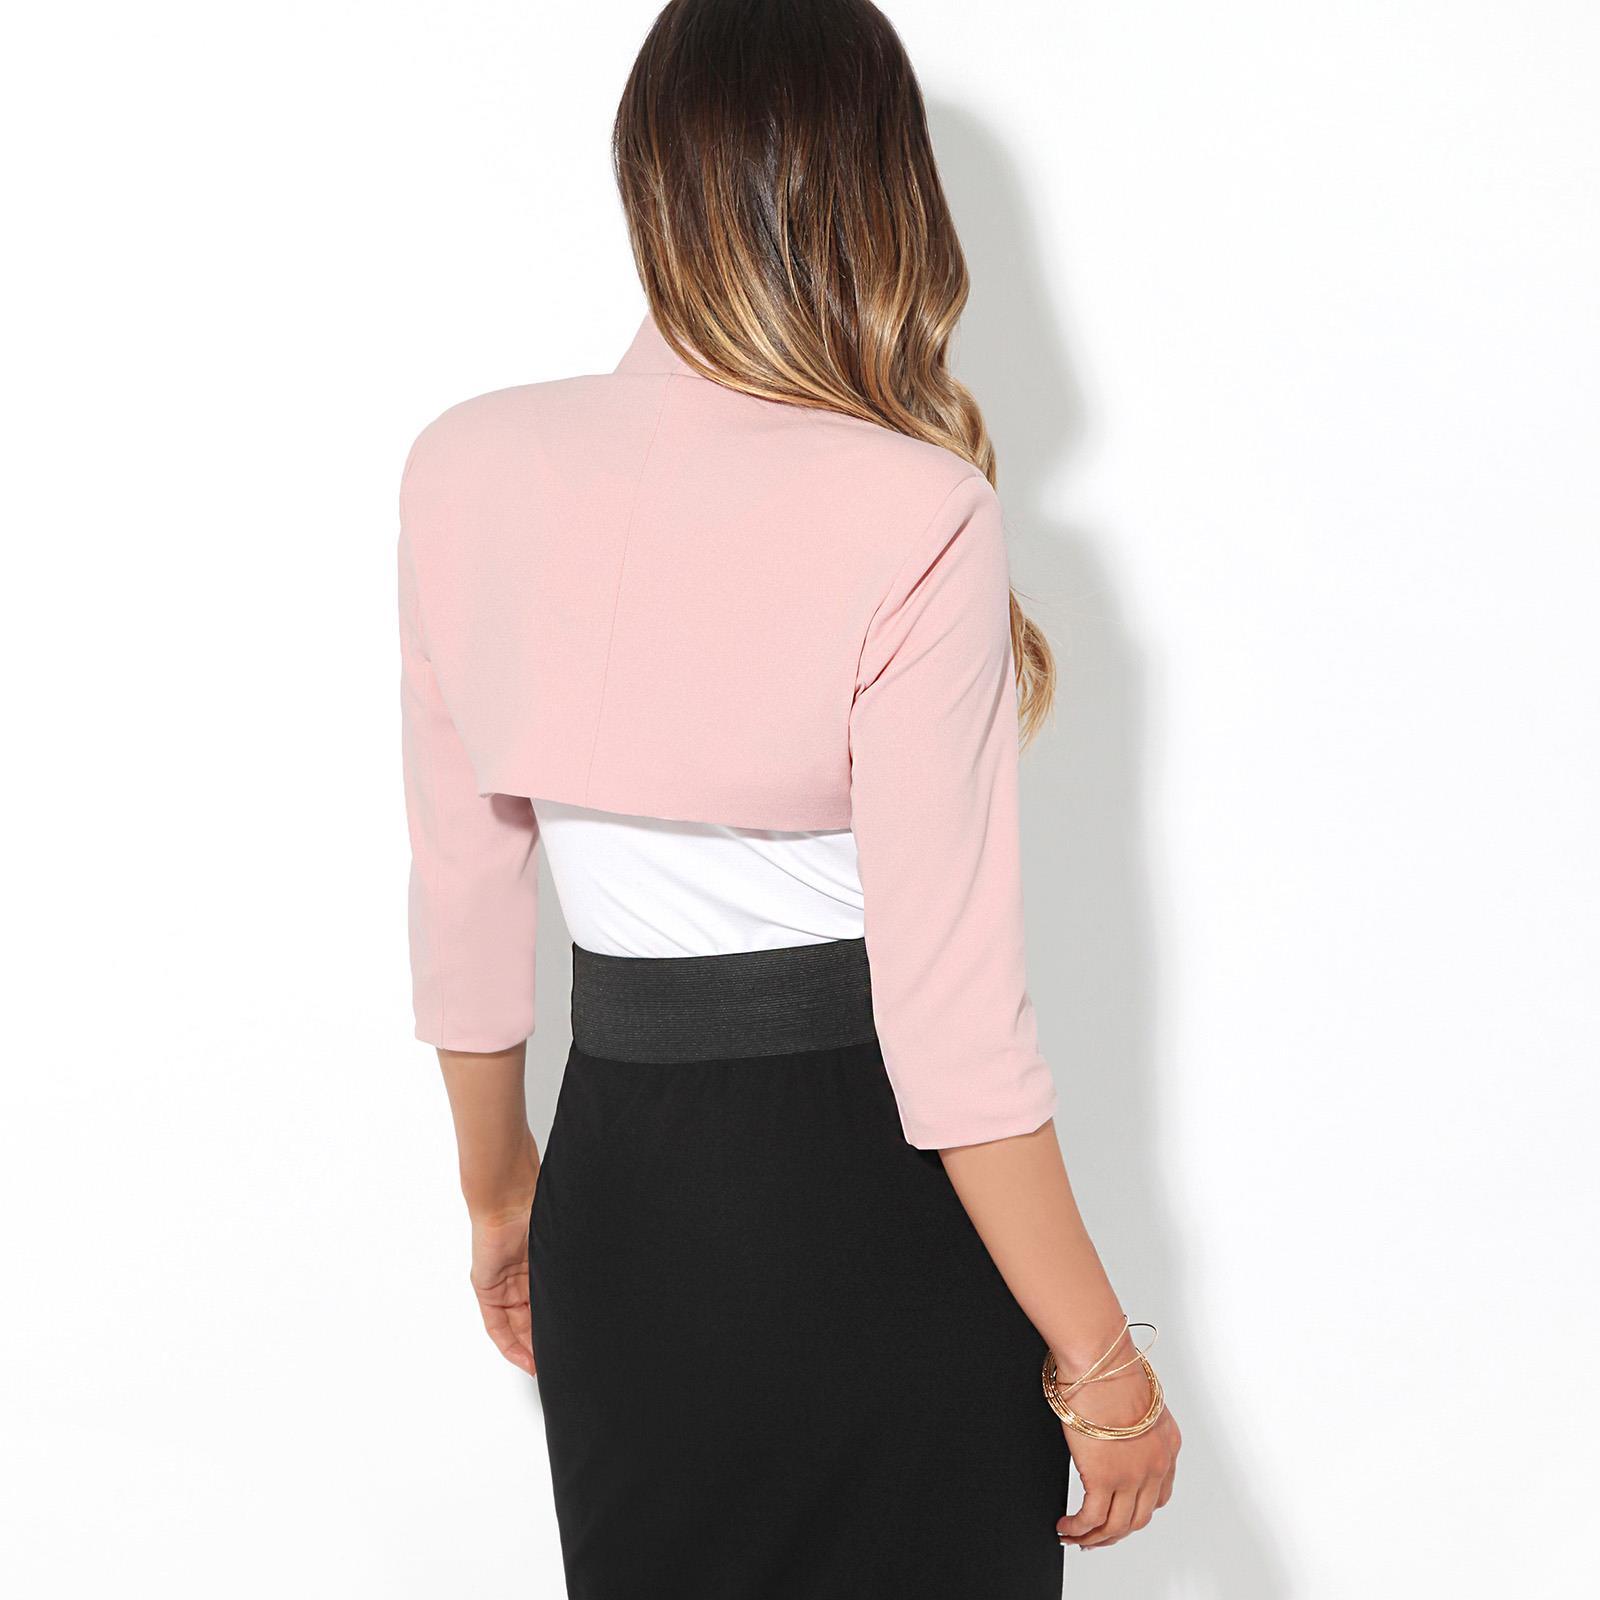 Womens-Tailored-Bolero-Shrug-Cropped-Top-Short-Sleeve-Party-Blazer-Jacket-Coat thumbnail 14